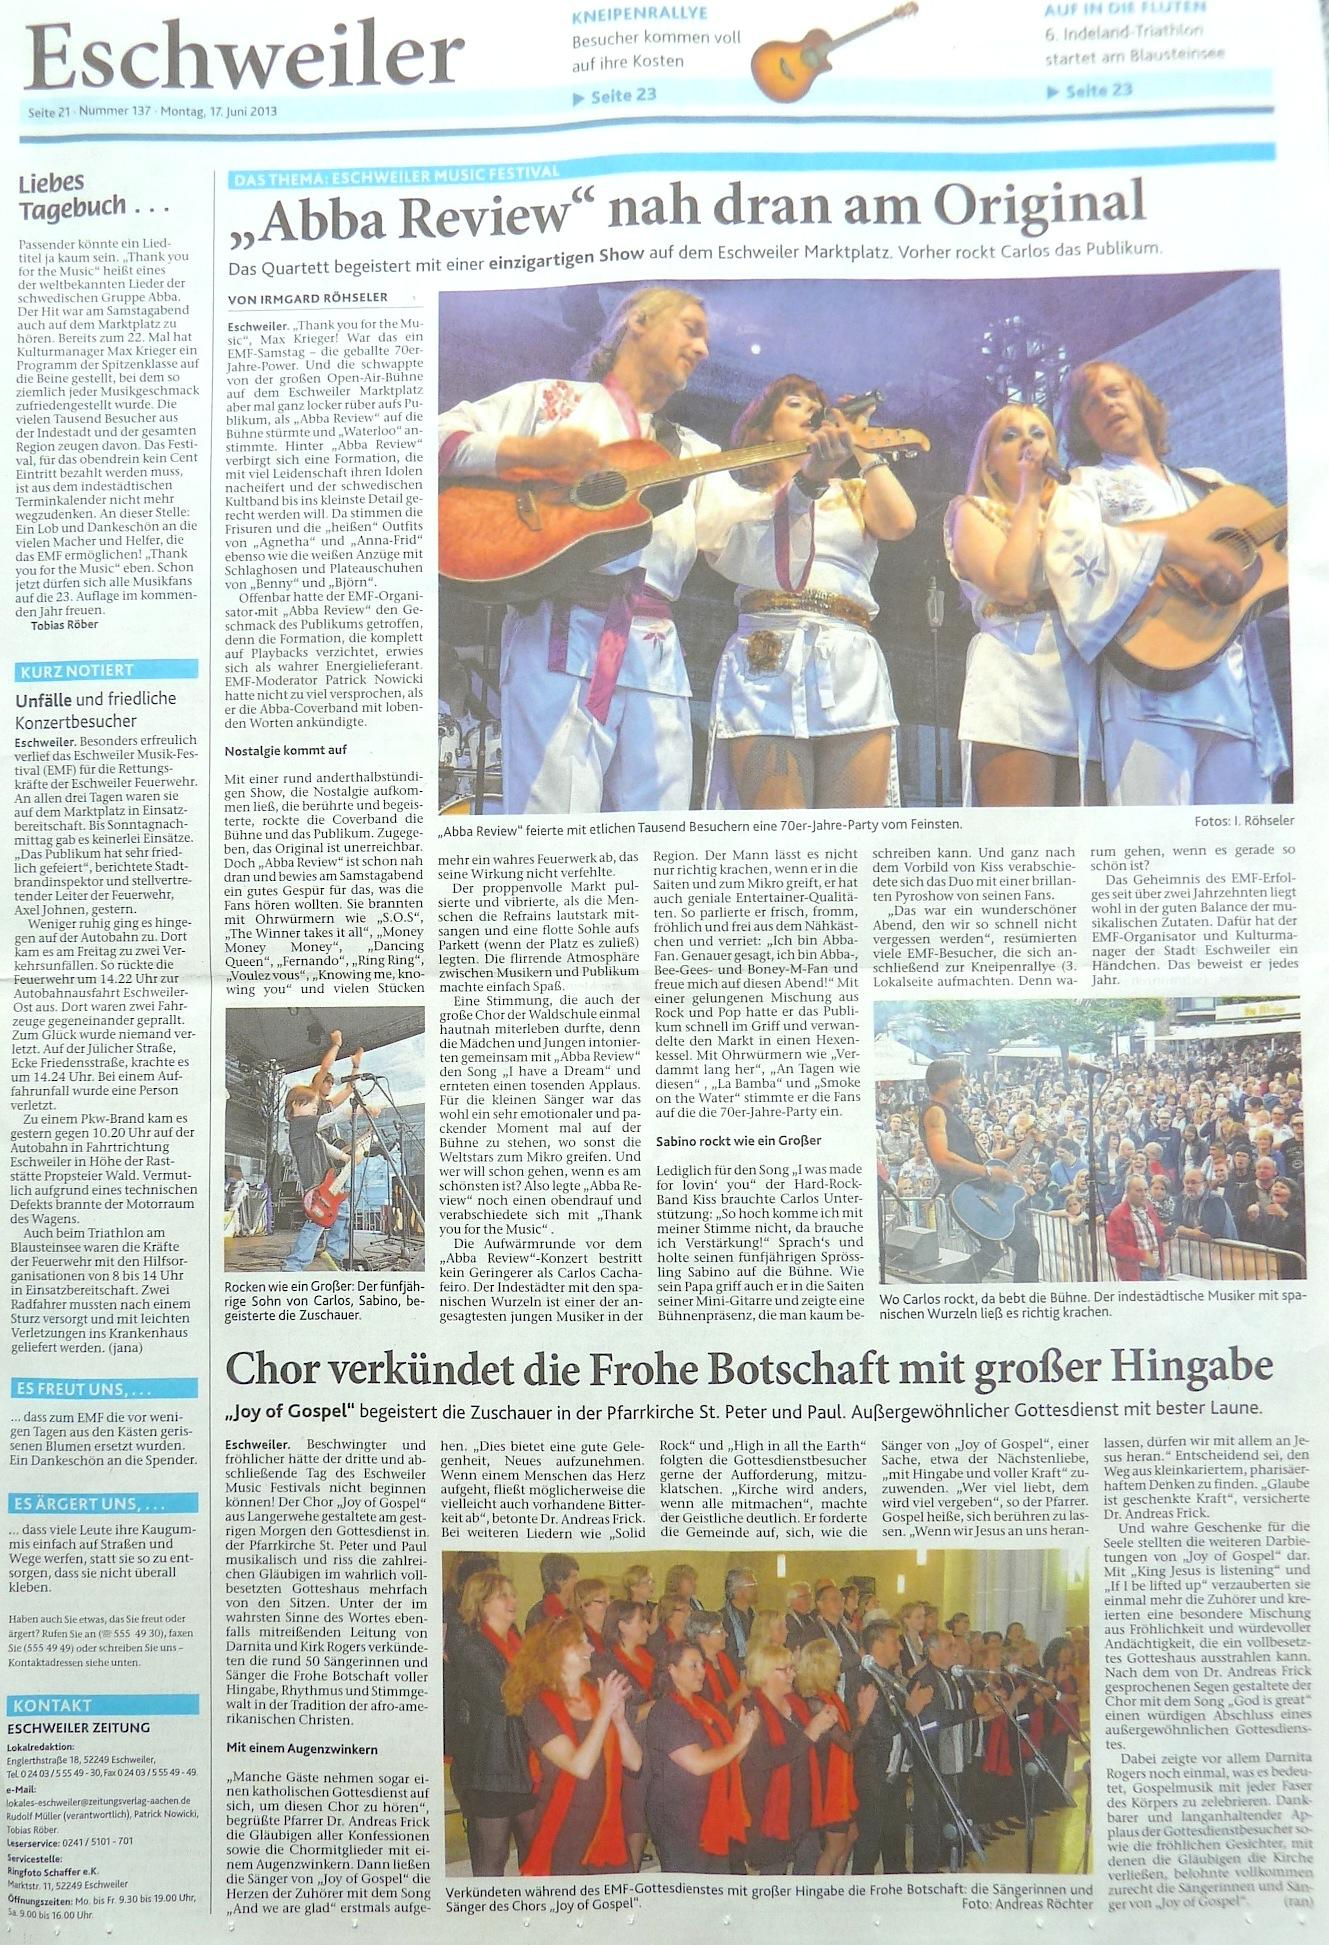 EMF - Eschweiler Music Festival | Presse  EMF - Eschweile...